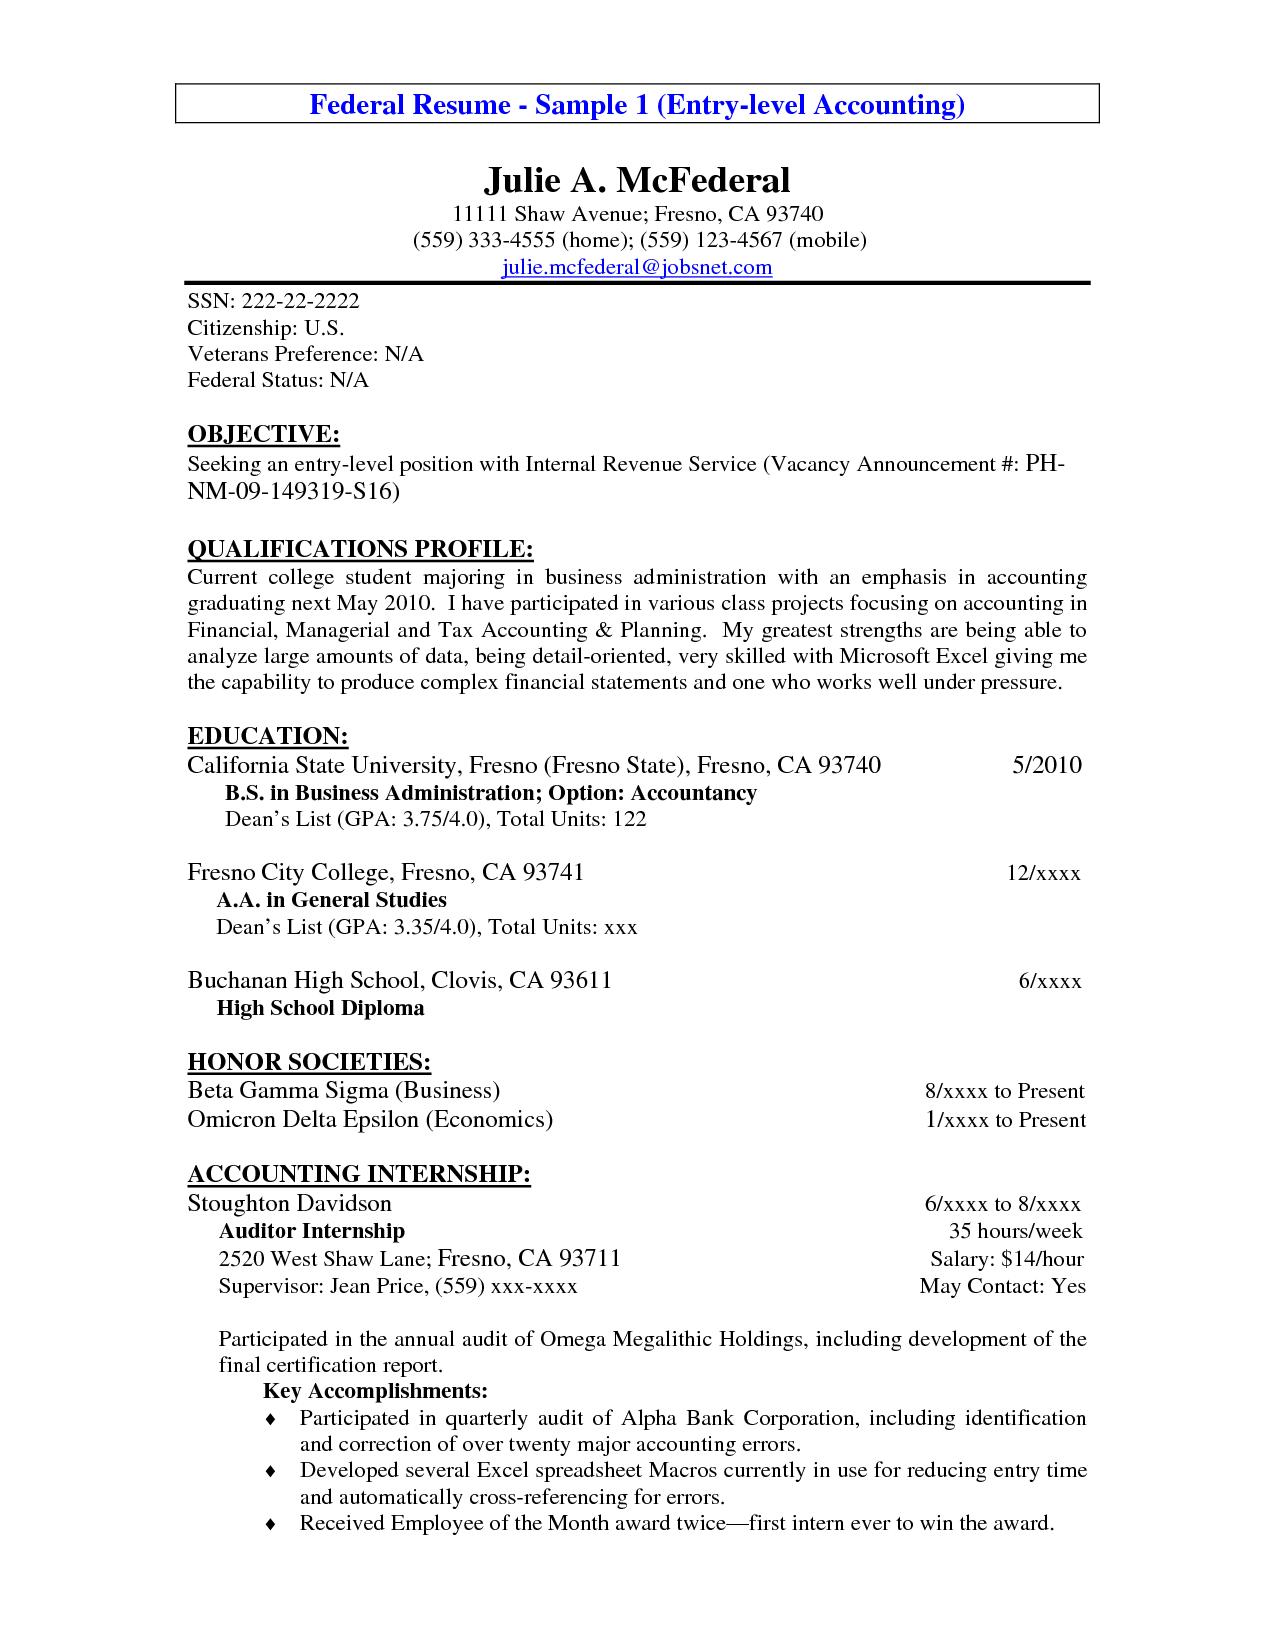 career objective sample for accountants